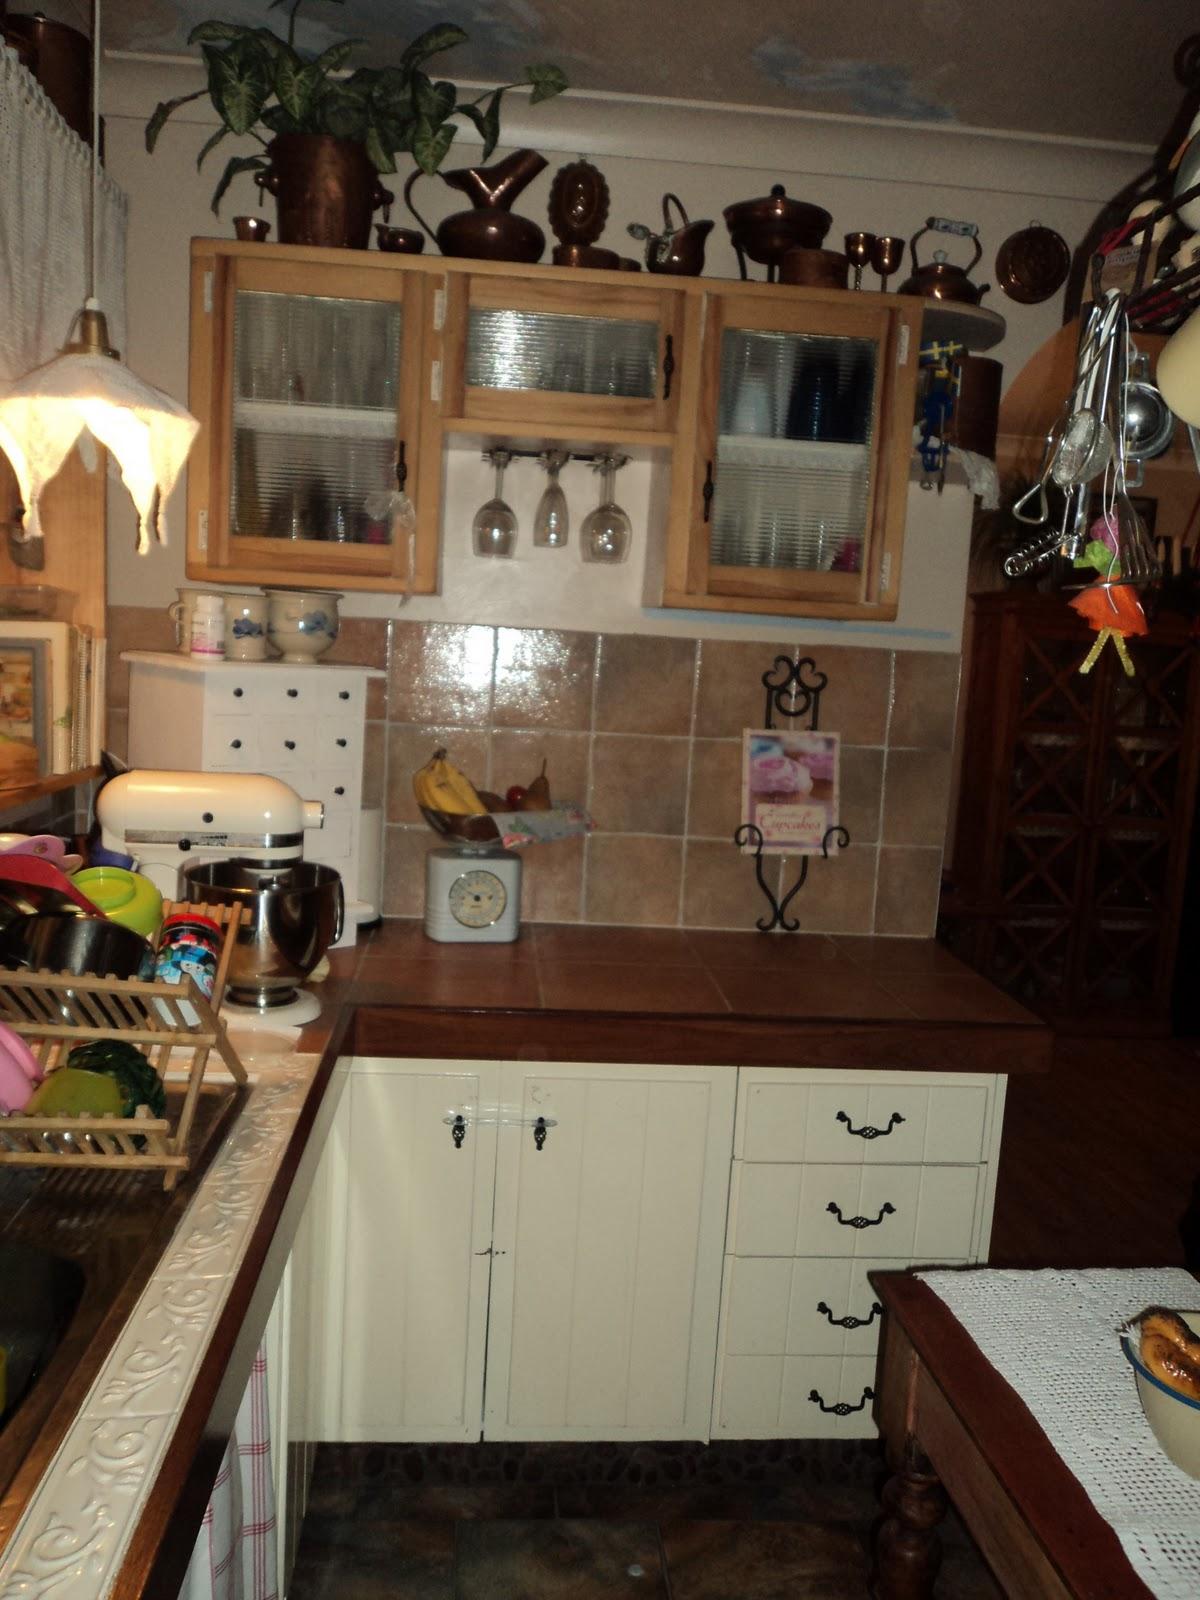 Http Kitchen Aid Ru Komplekt Myasorubka Protirka Html